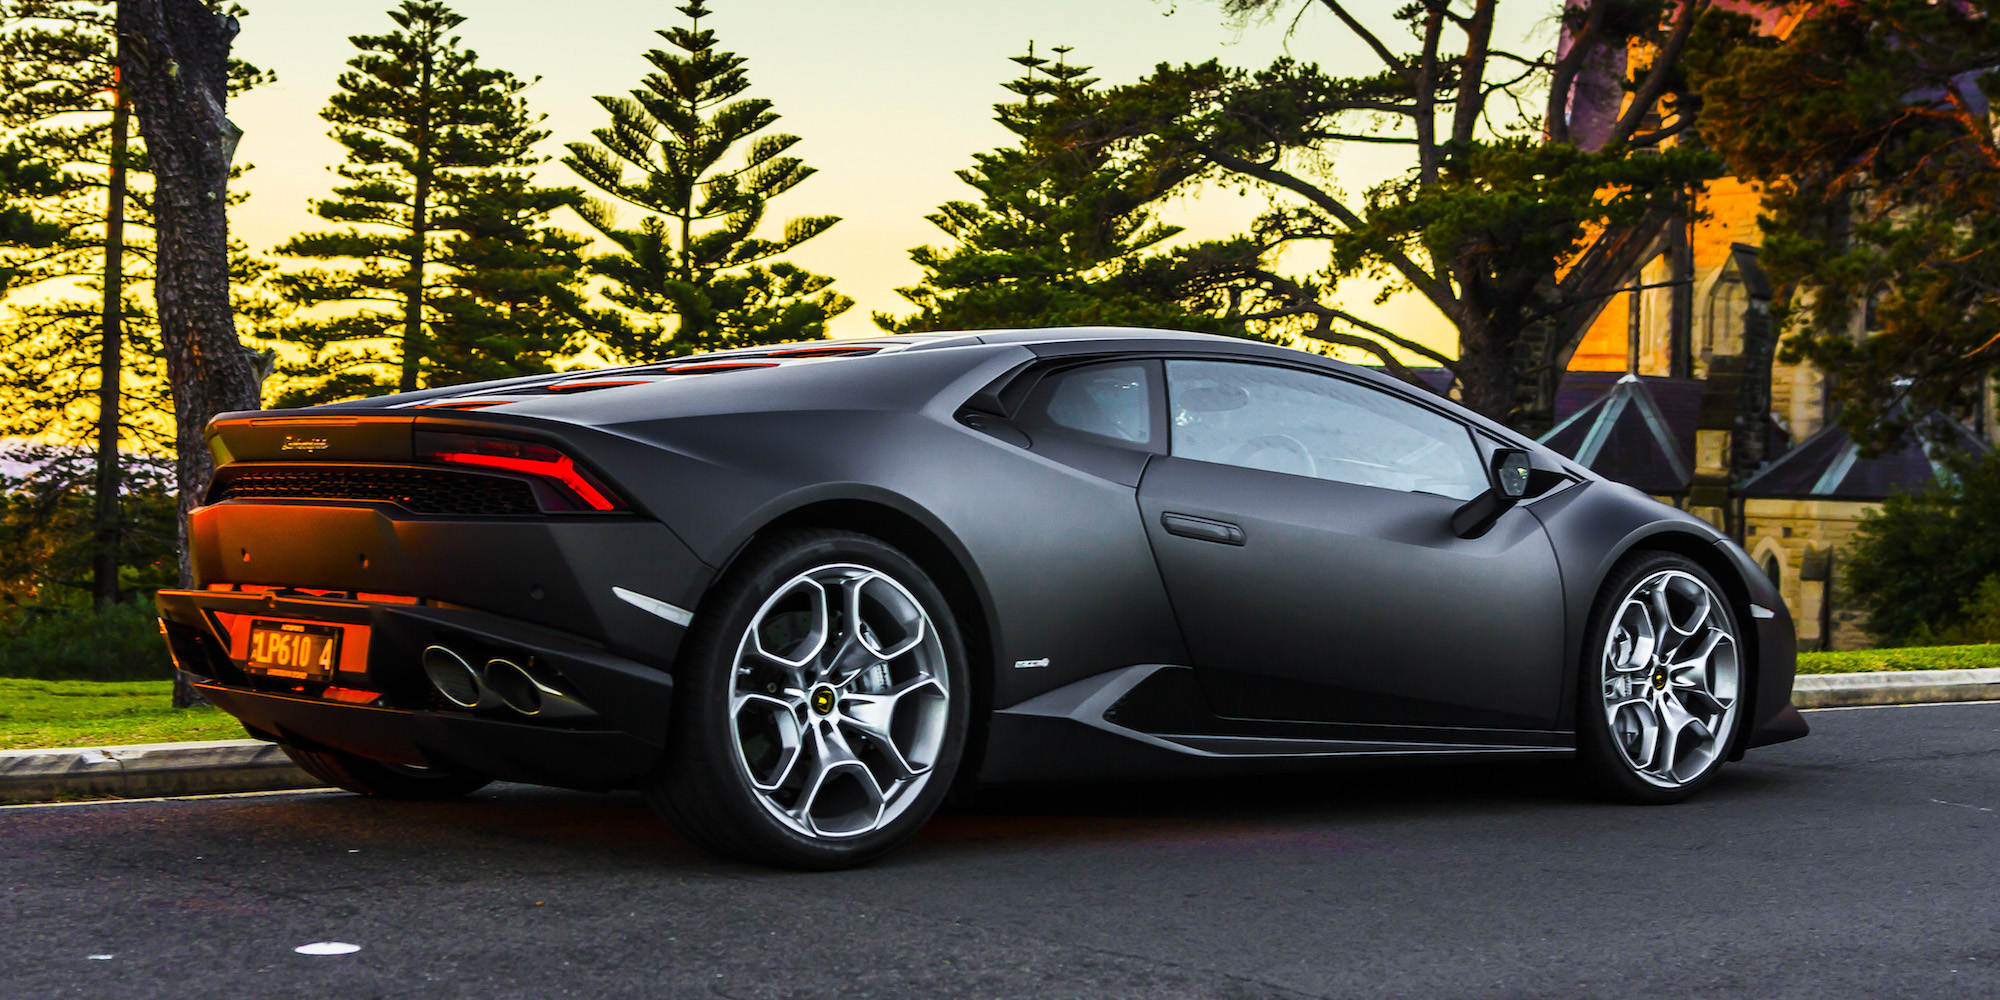 Lamborghini Price 2017 >> 2015 Lamborghini Huracan LP610-4 Review | CarAdvice